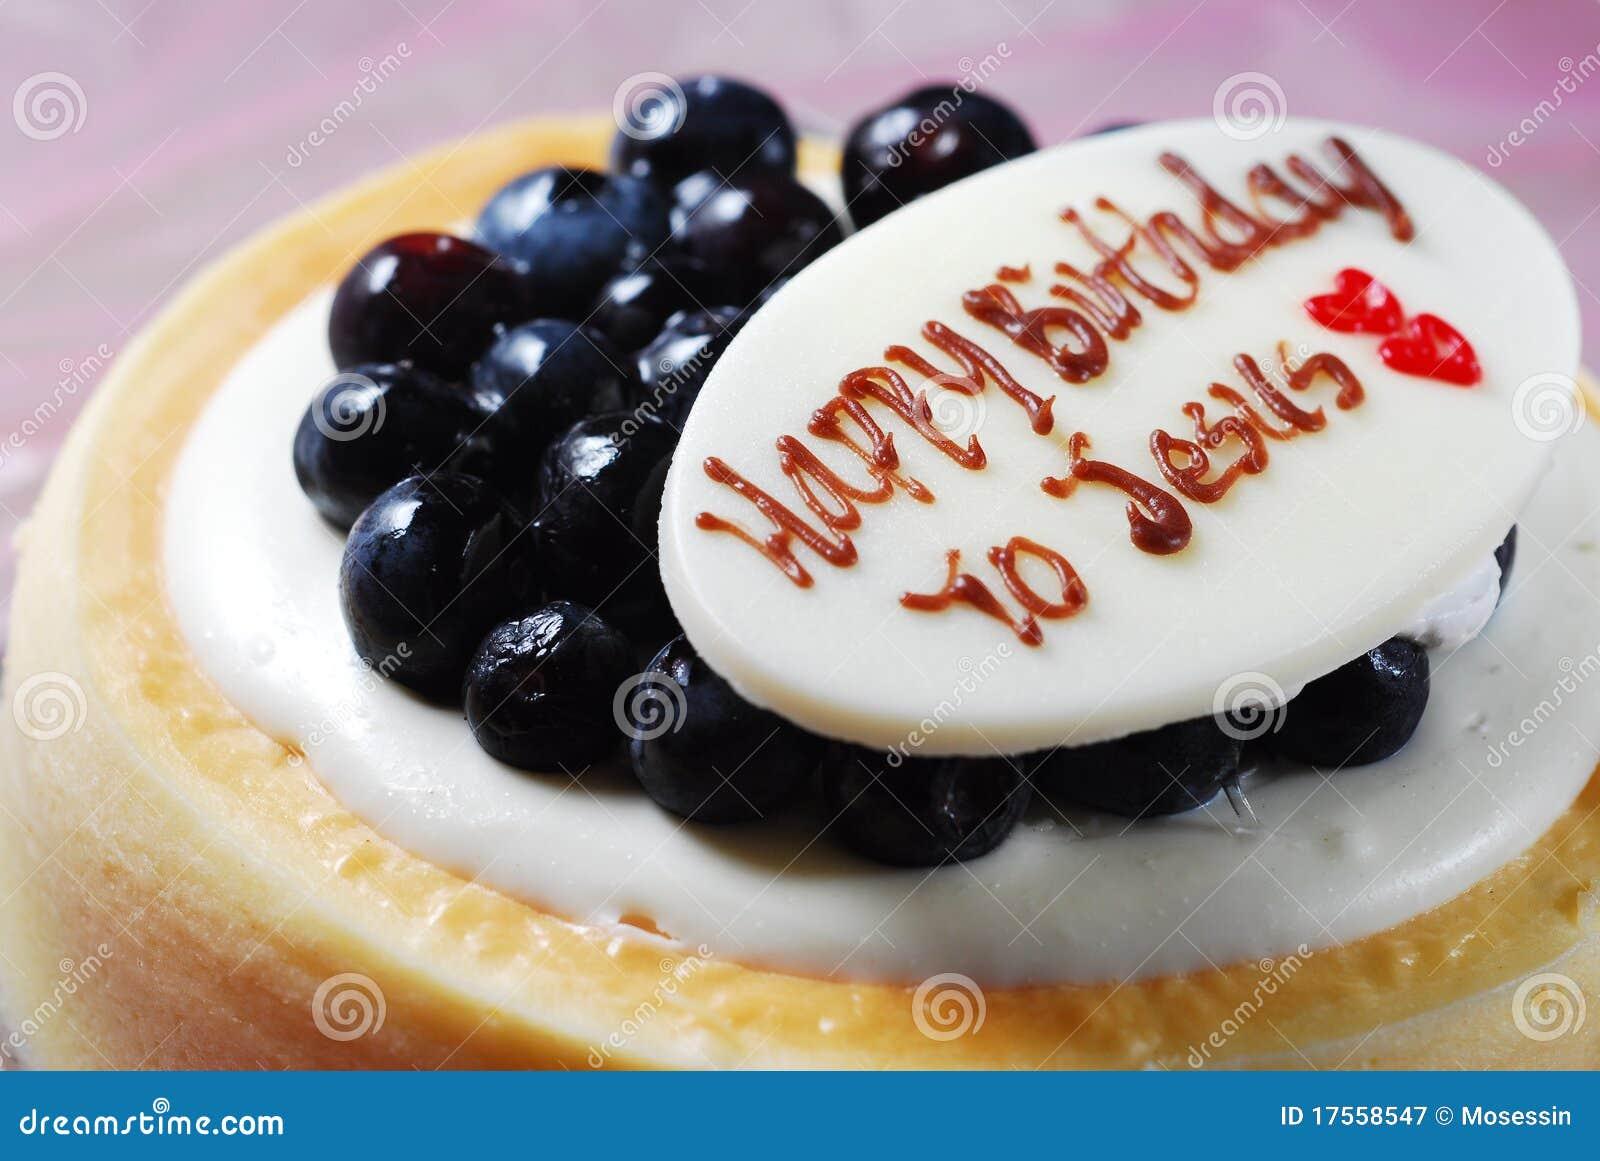 Jesus Birthday Cake Stock Image Image Of Cheese Passion 17558547